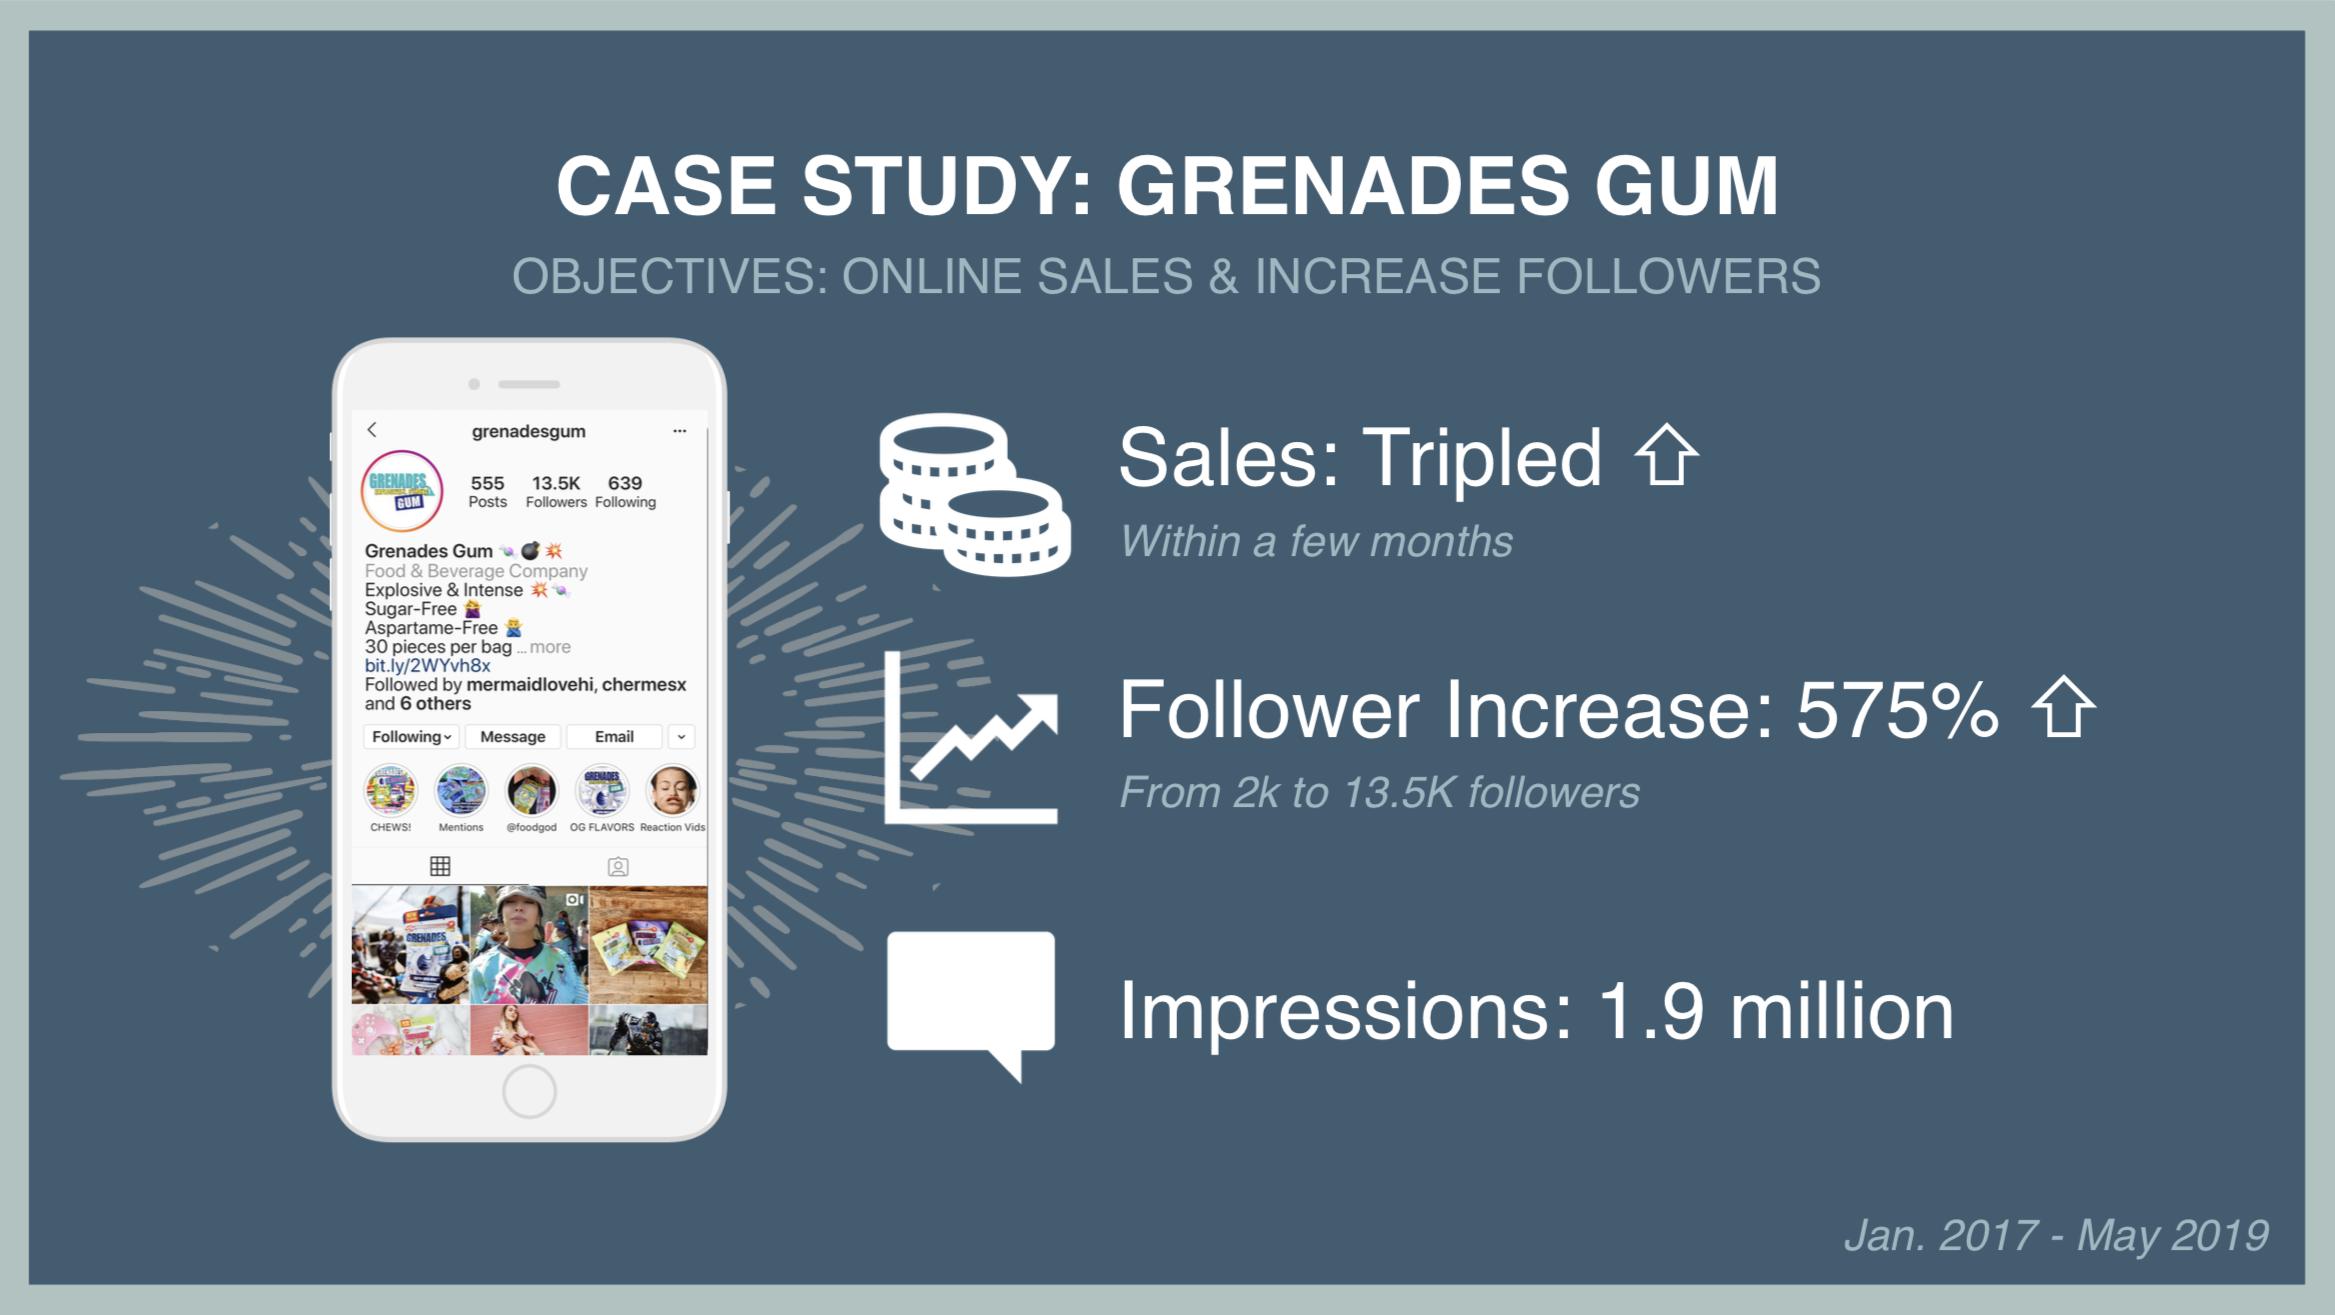 Grenades Gum Case Study.png